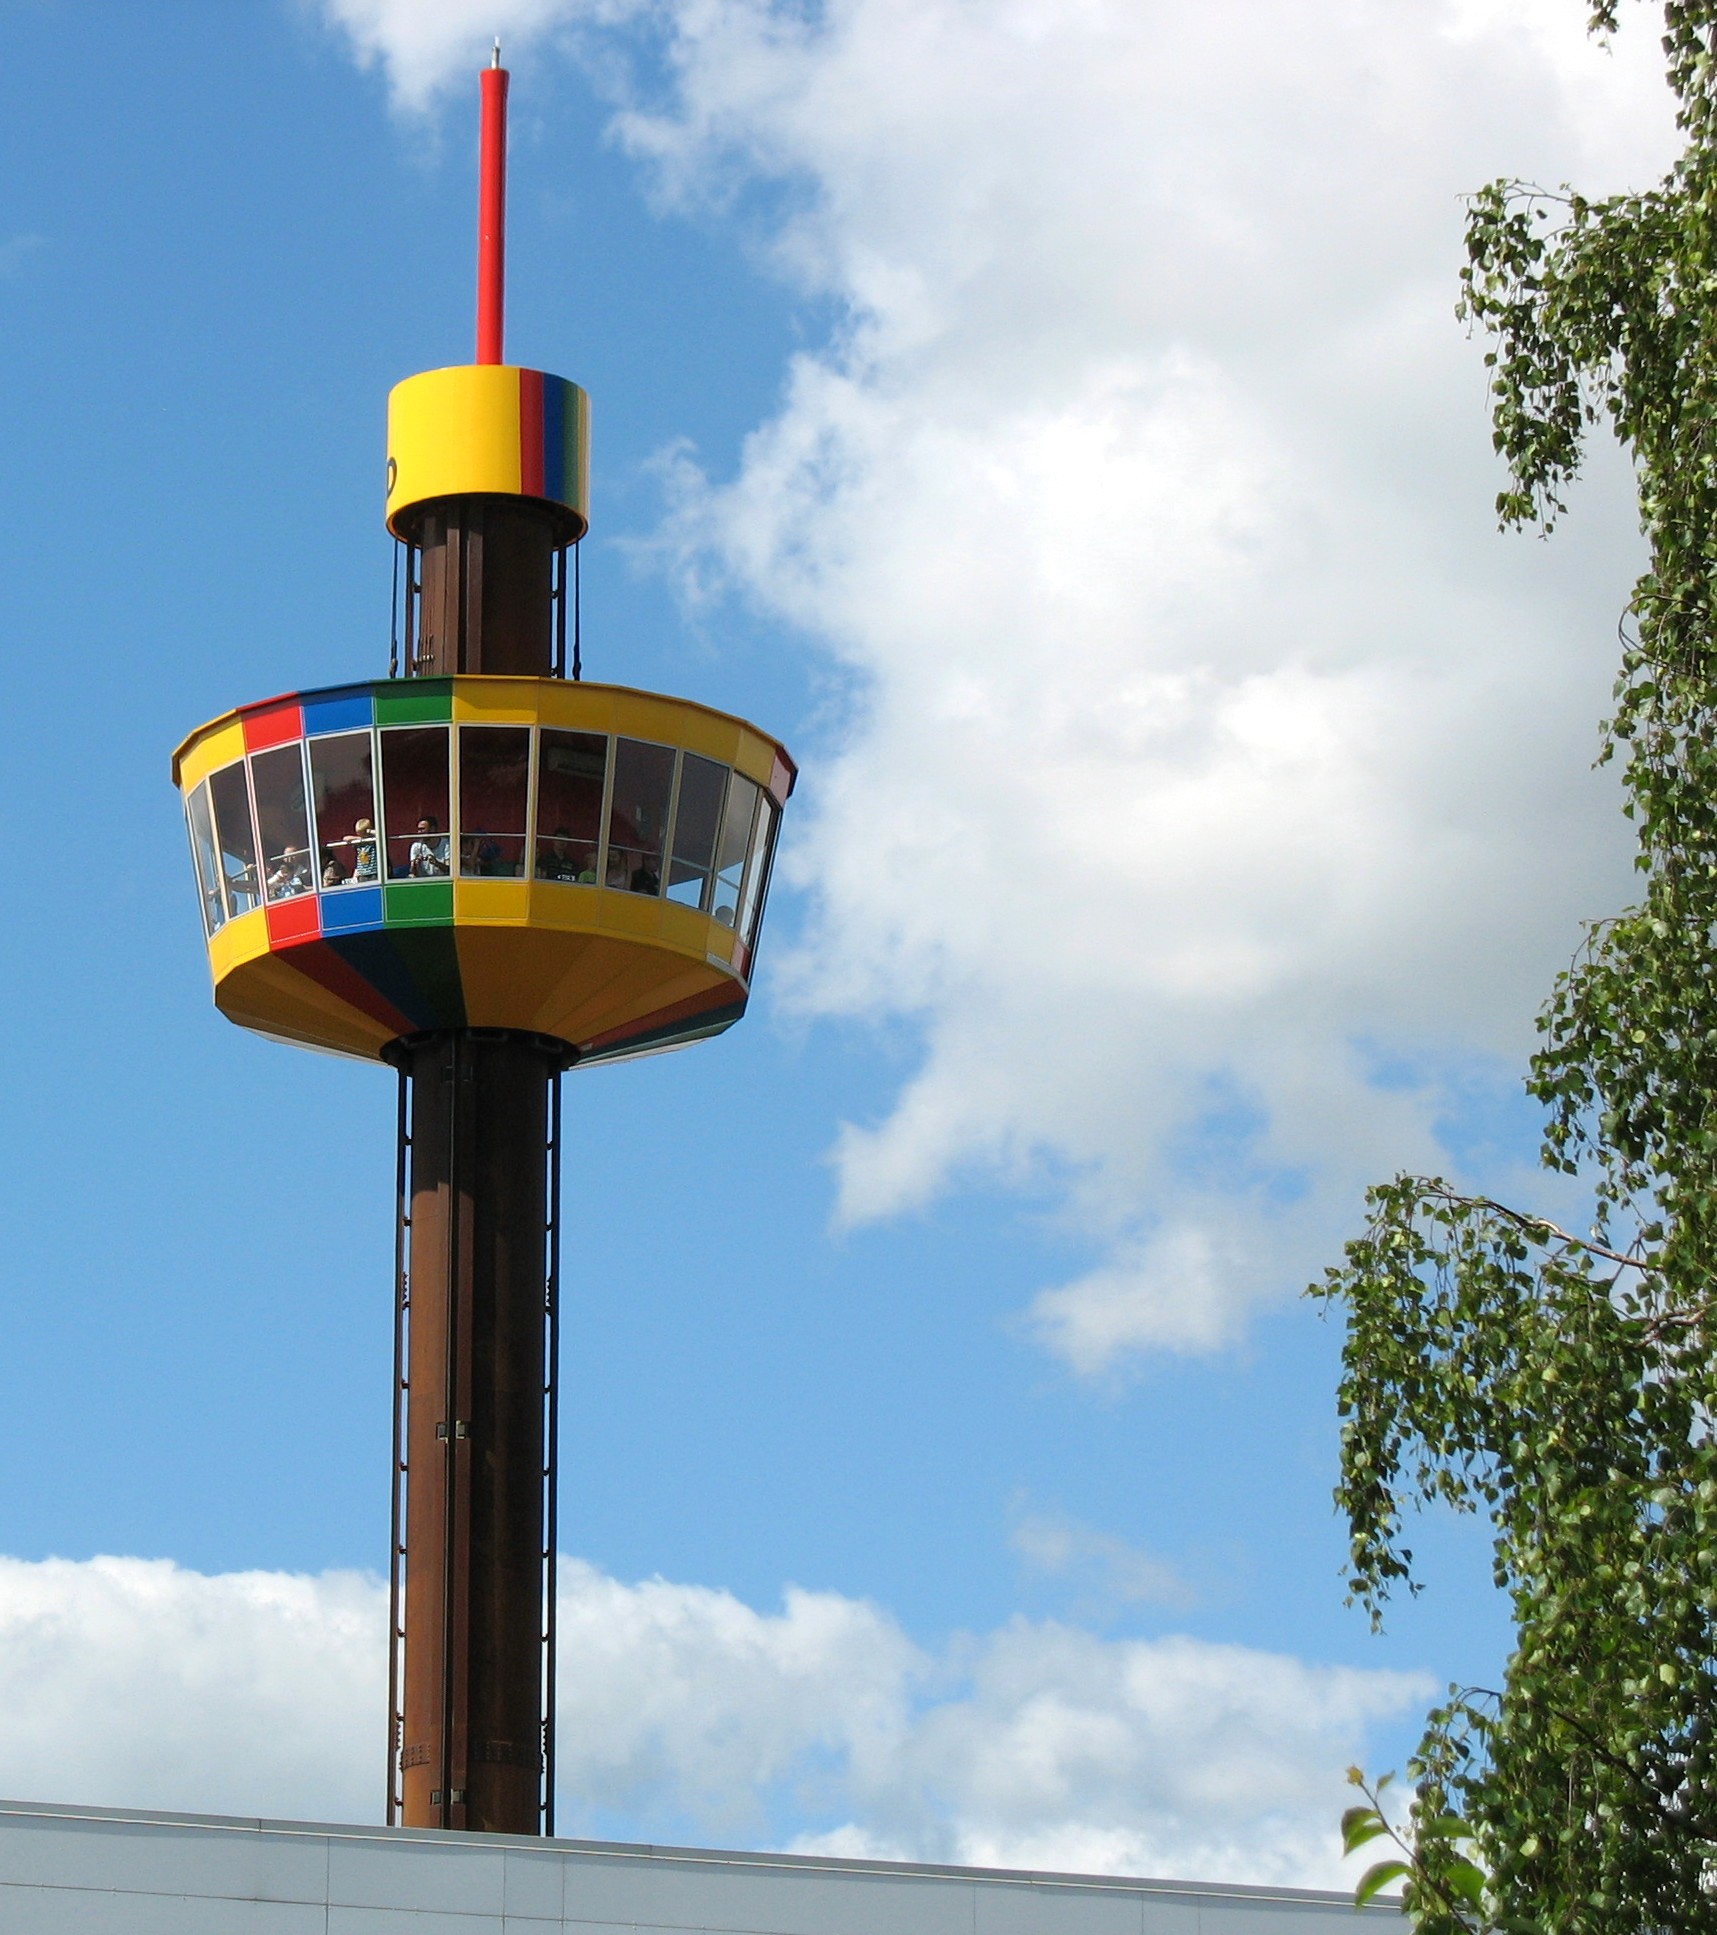 Legoland Billund | Mapio.net